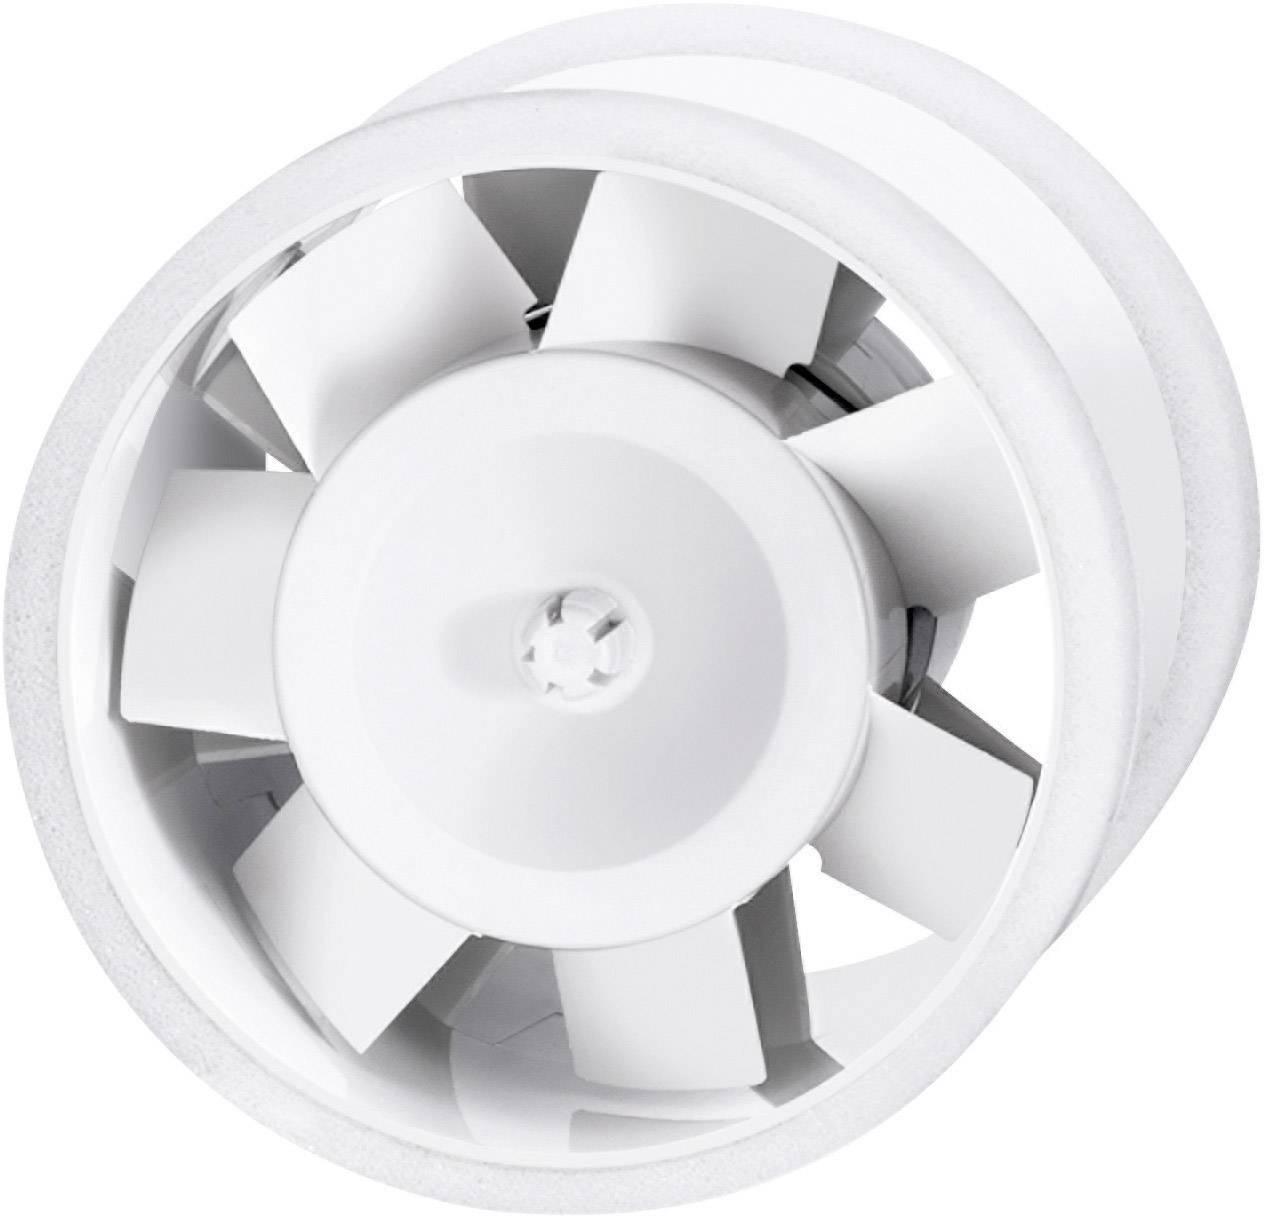 Ventilátor do potrubí Sygonix, 110 m³/h, 100 mm, bílá